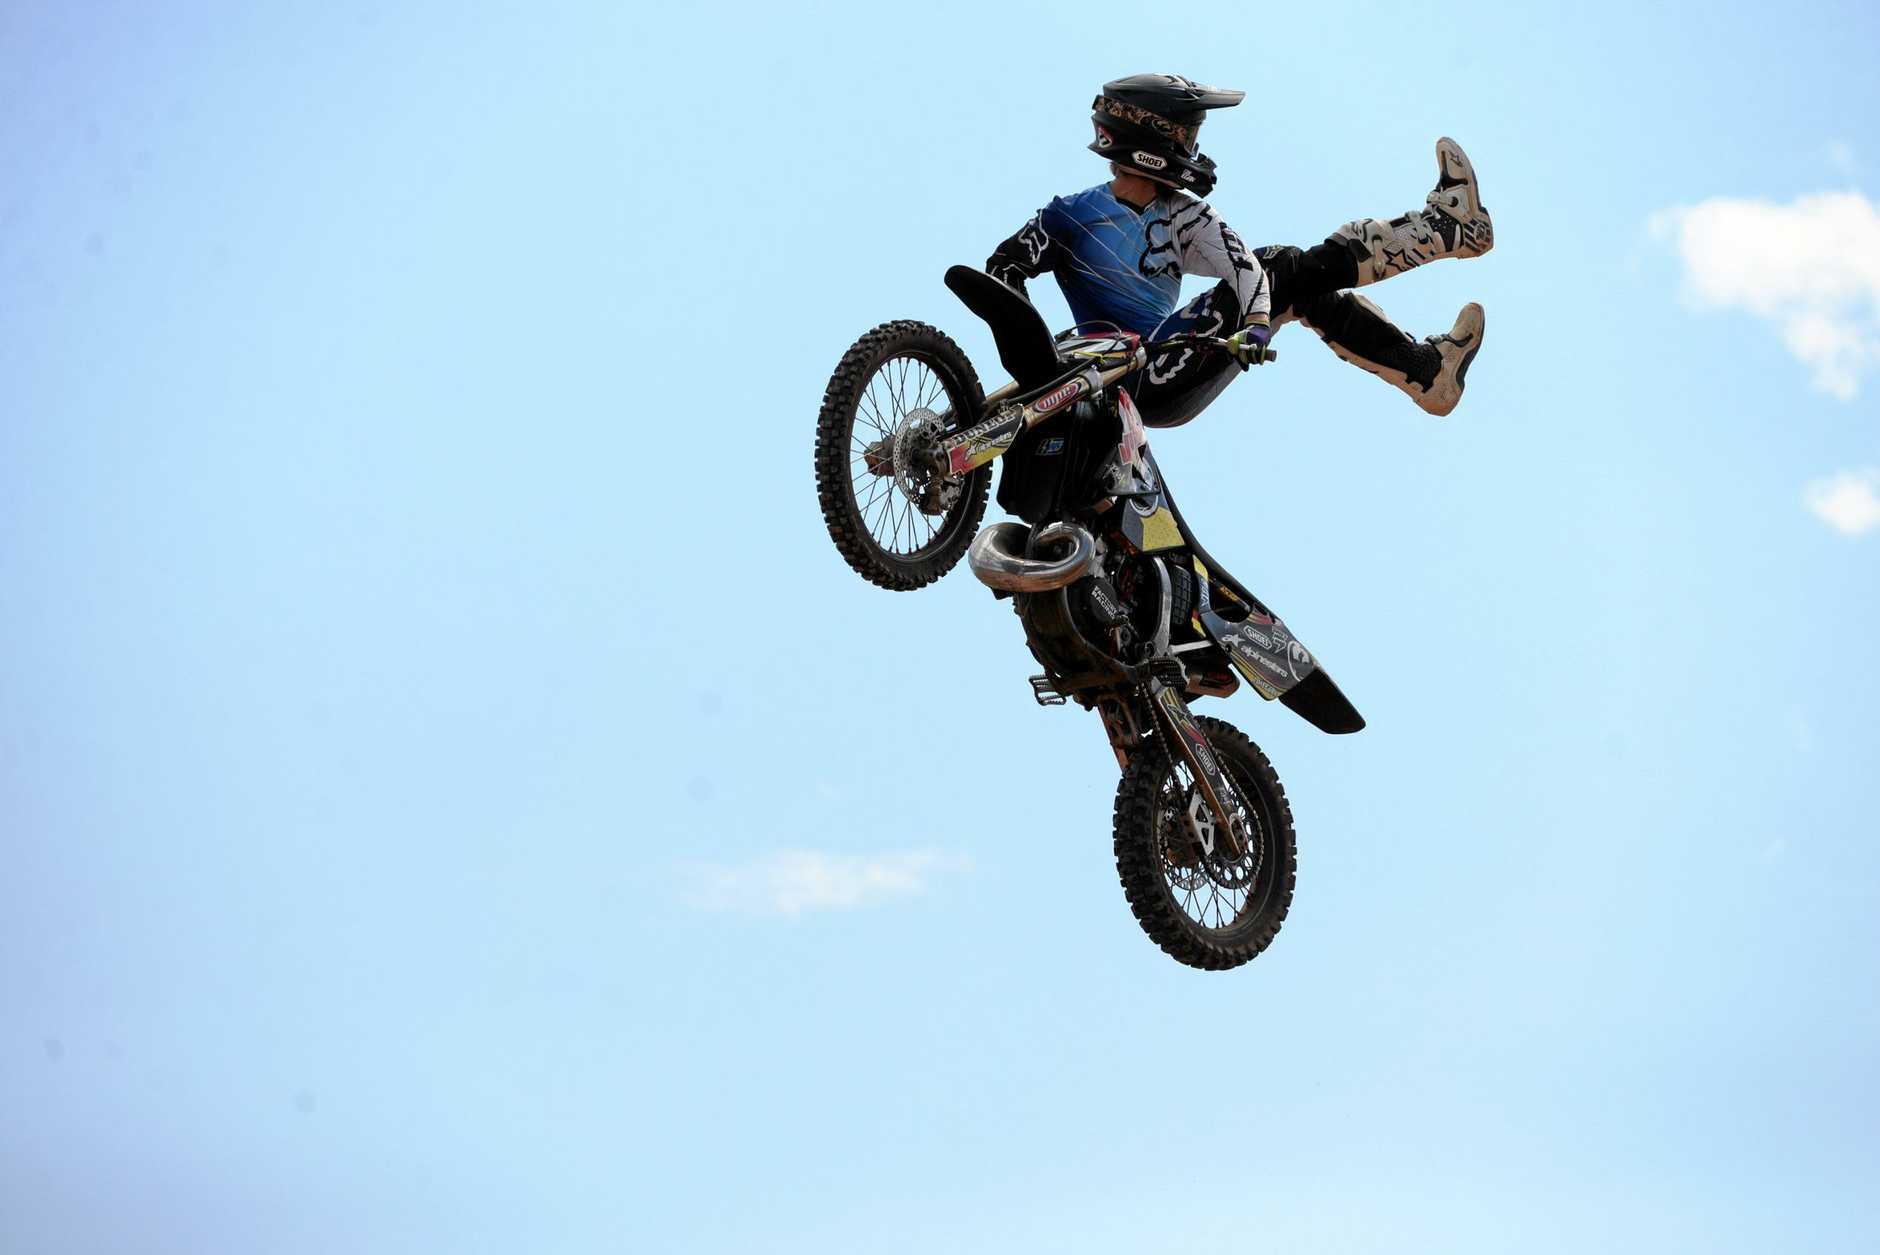 SKILLS: Tim Egan negotiates a jump at the Carina Speedway, Bundaberg. He will perform motocross stunts on Saturday and Sunday at the Gladstone Region 1770 Festival.